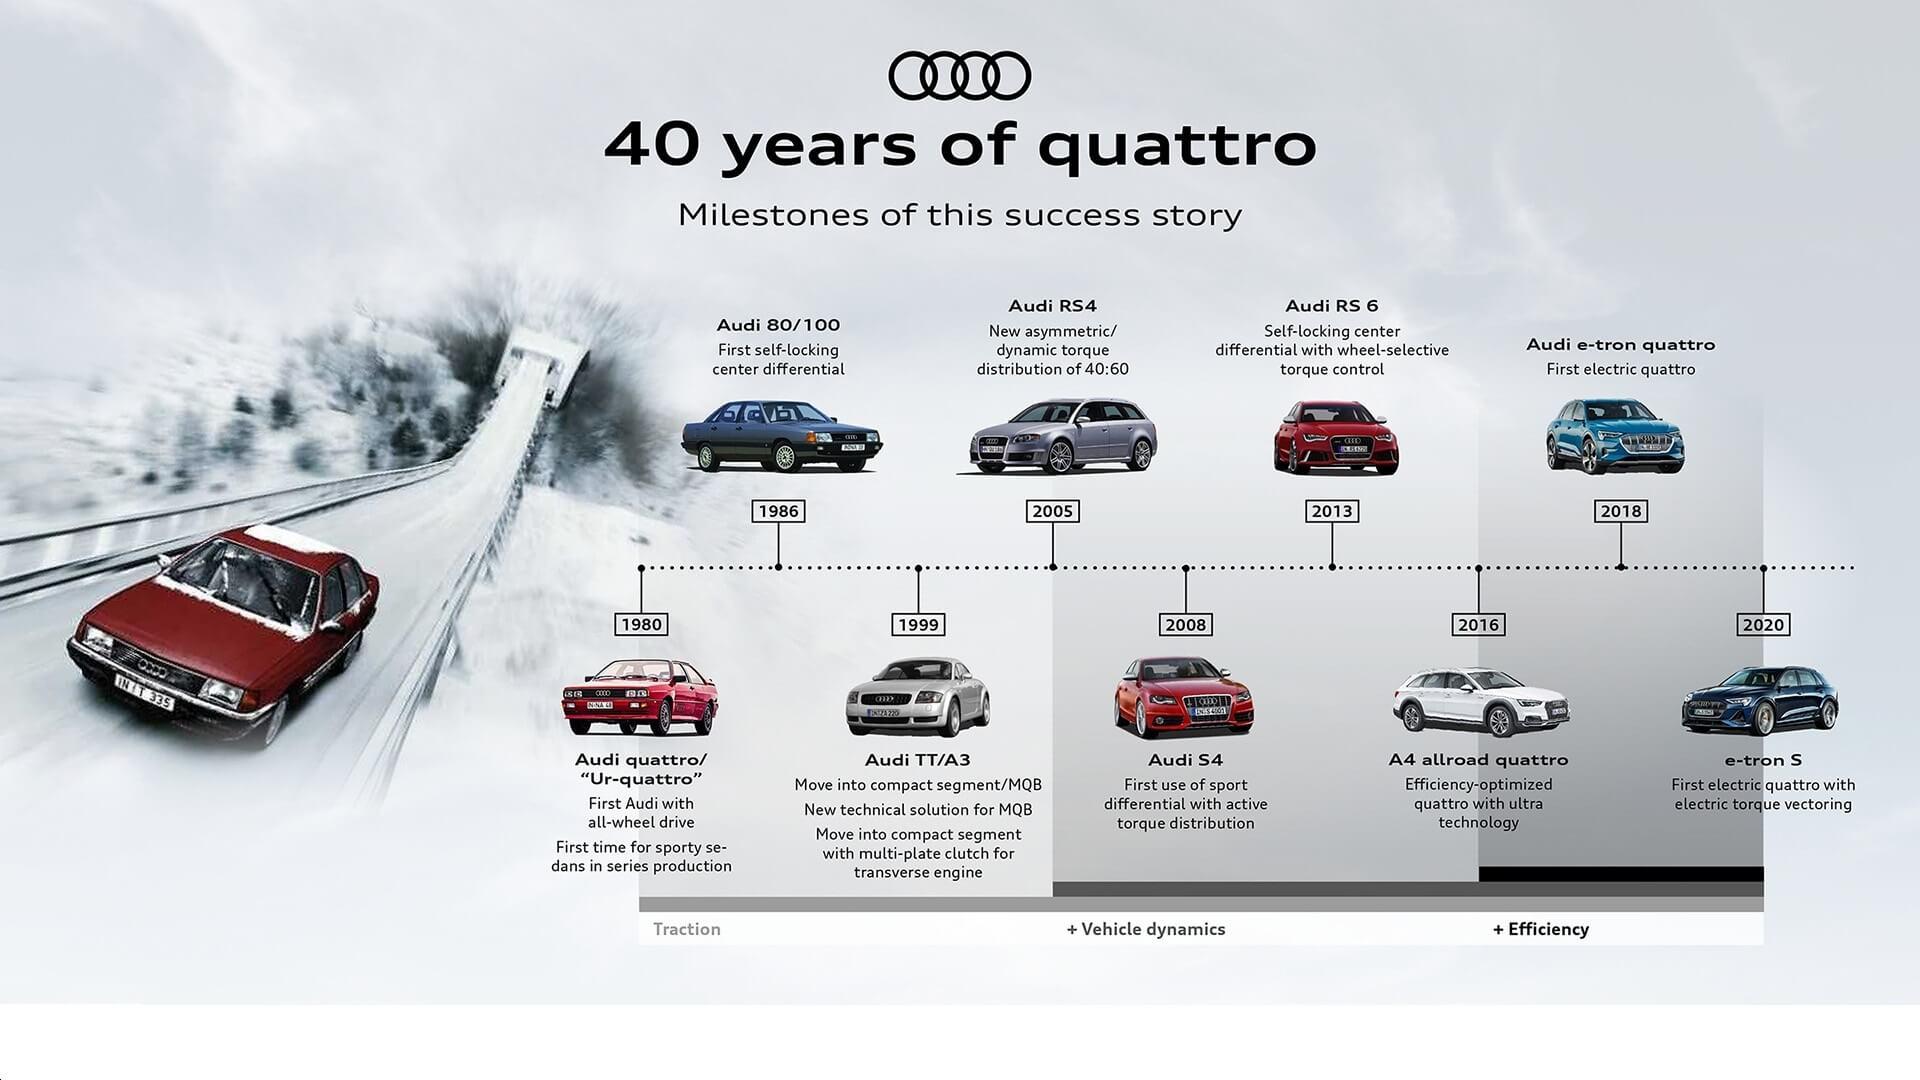 Audi Quattro - 40 χρόνια - Ορόσημα σε χρονοδιάγραμμα